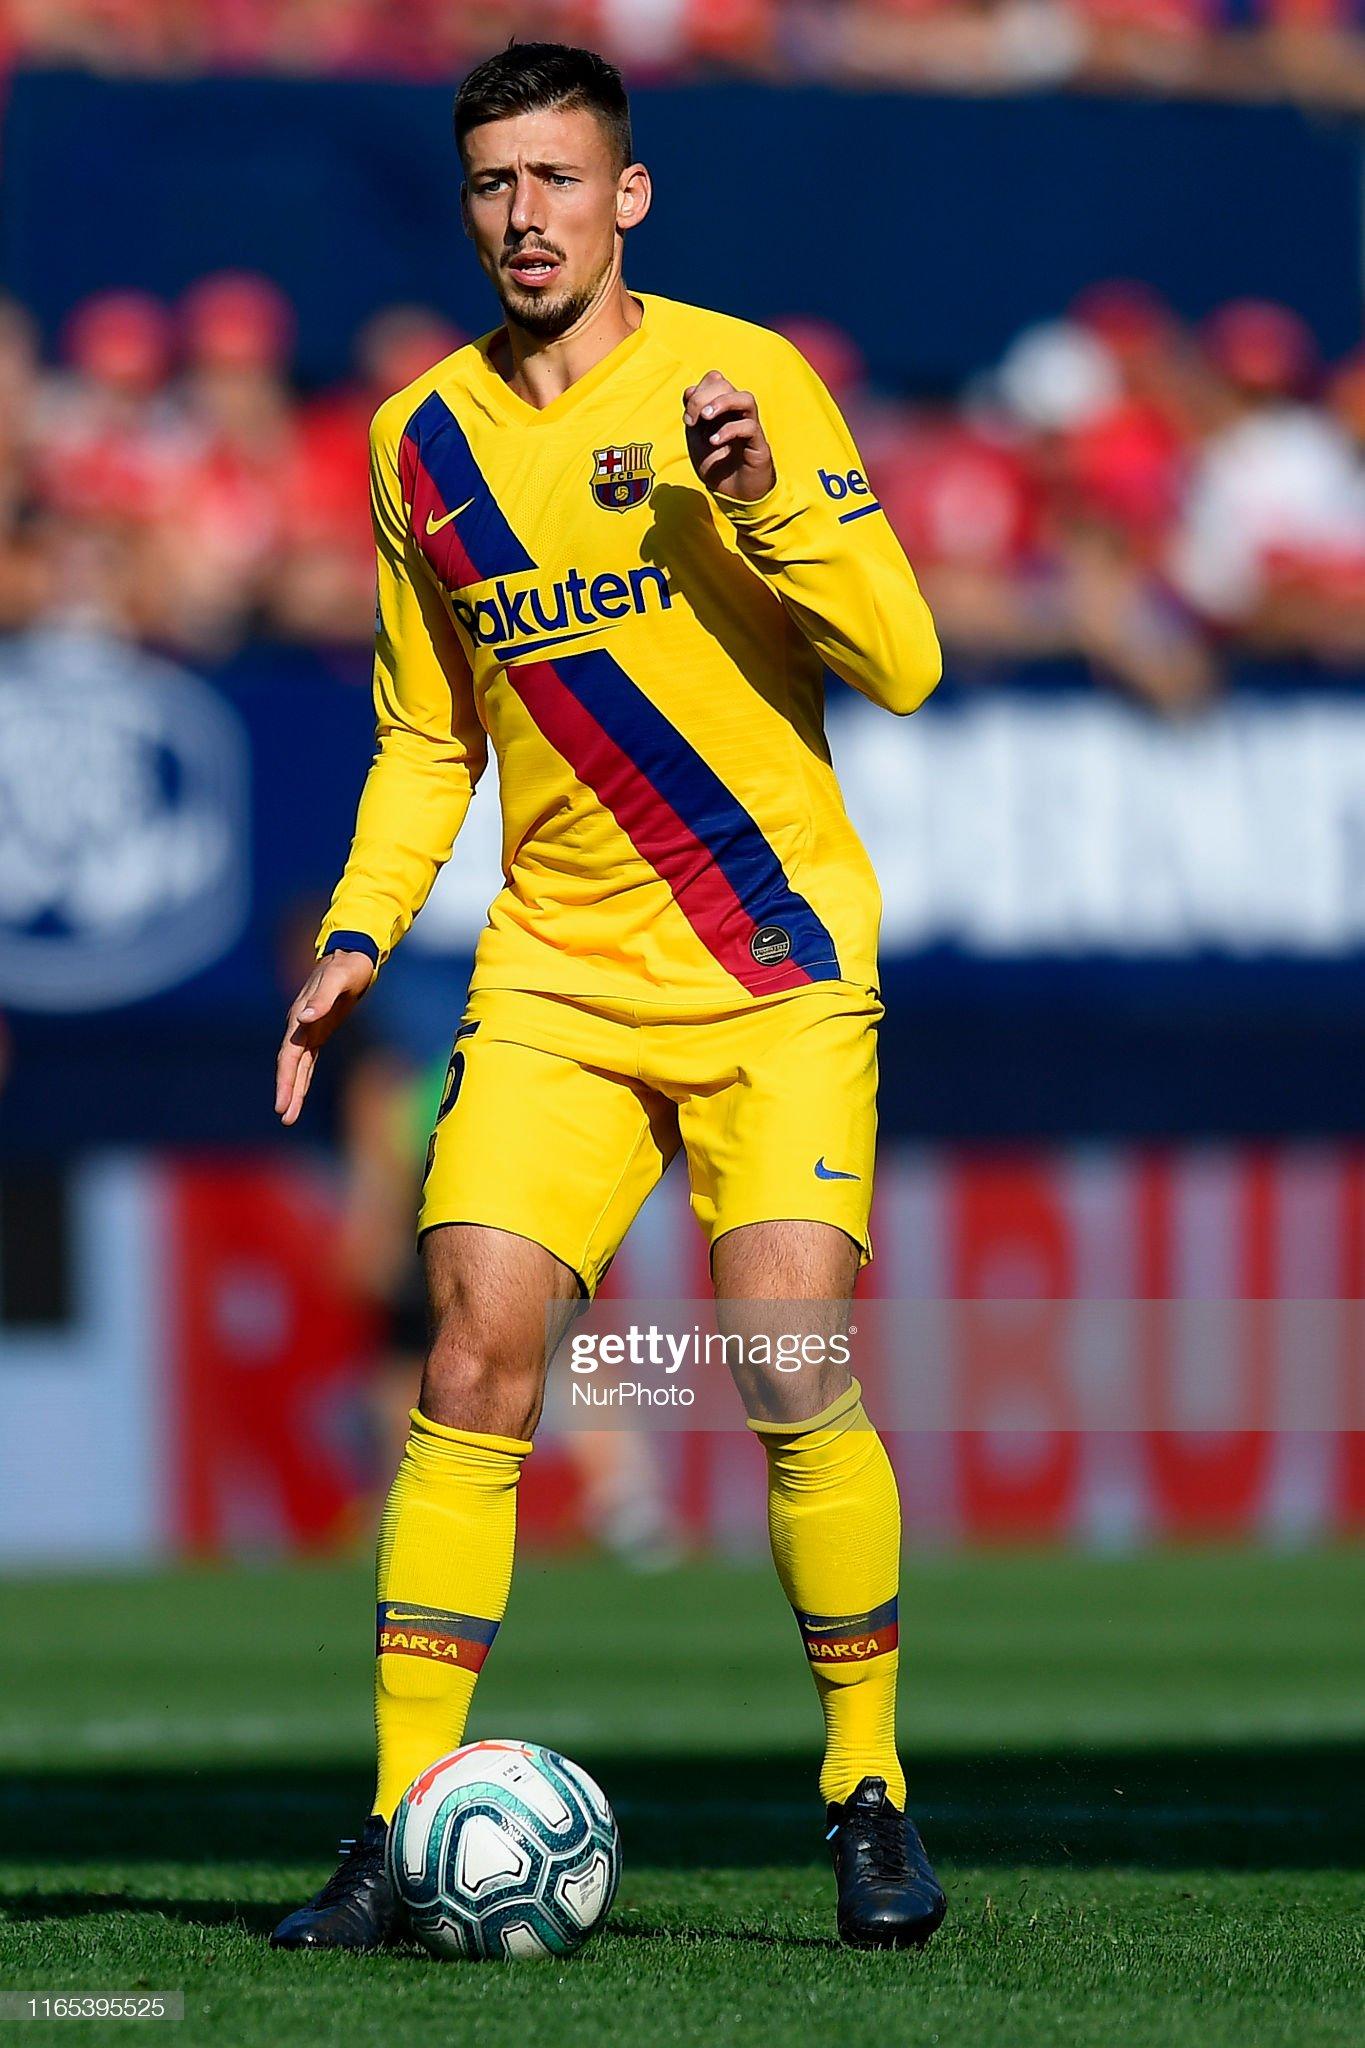 صور مباراة : أوساسونا - برشلونة 2-2 ( 31-08-2019 )  Clement-lenglet-of-barcelona-in-action-during-the-liga-match-between-picture-id1165395525?s=2048x2048